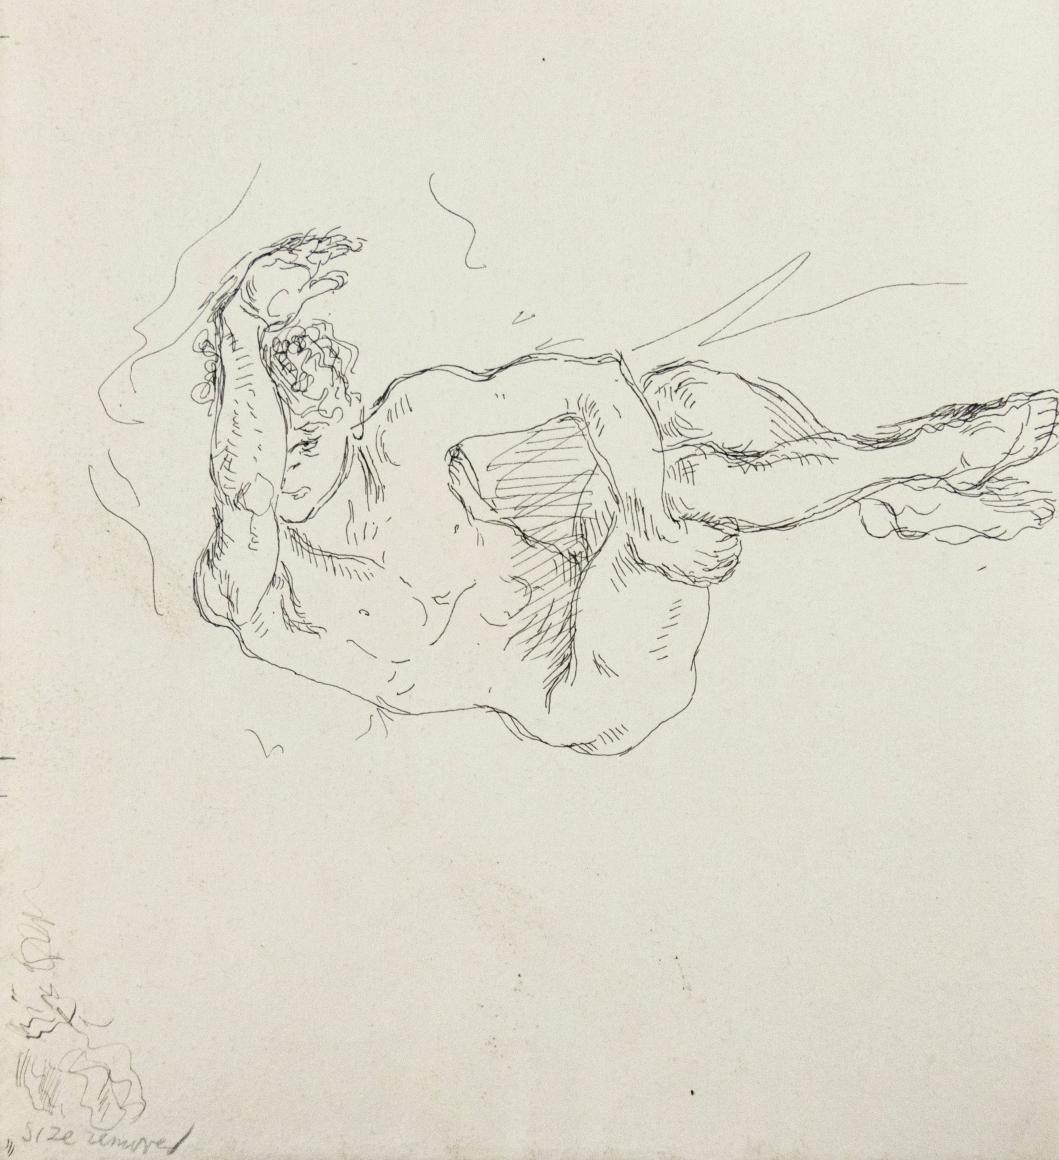 """Reclining Male Nude (Arm Raised)"", ca. 1930-1939"